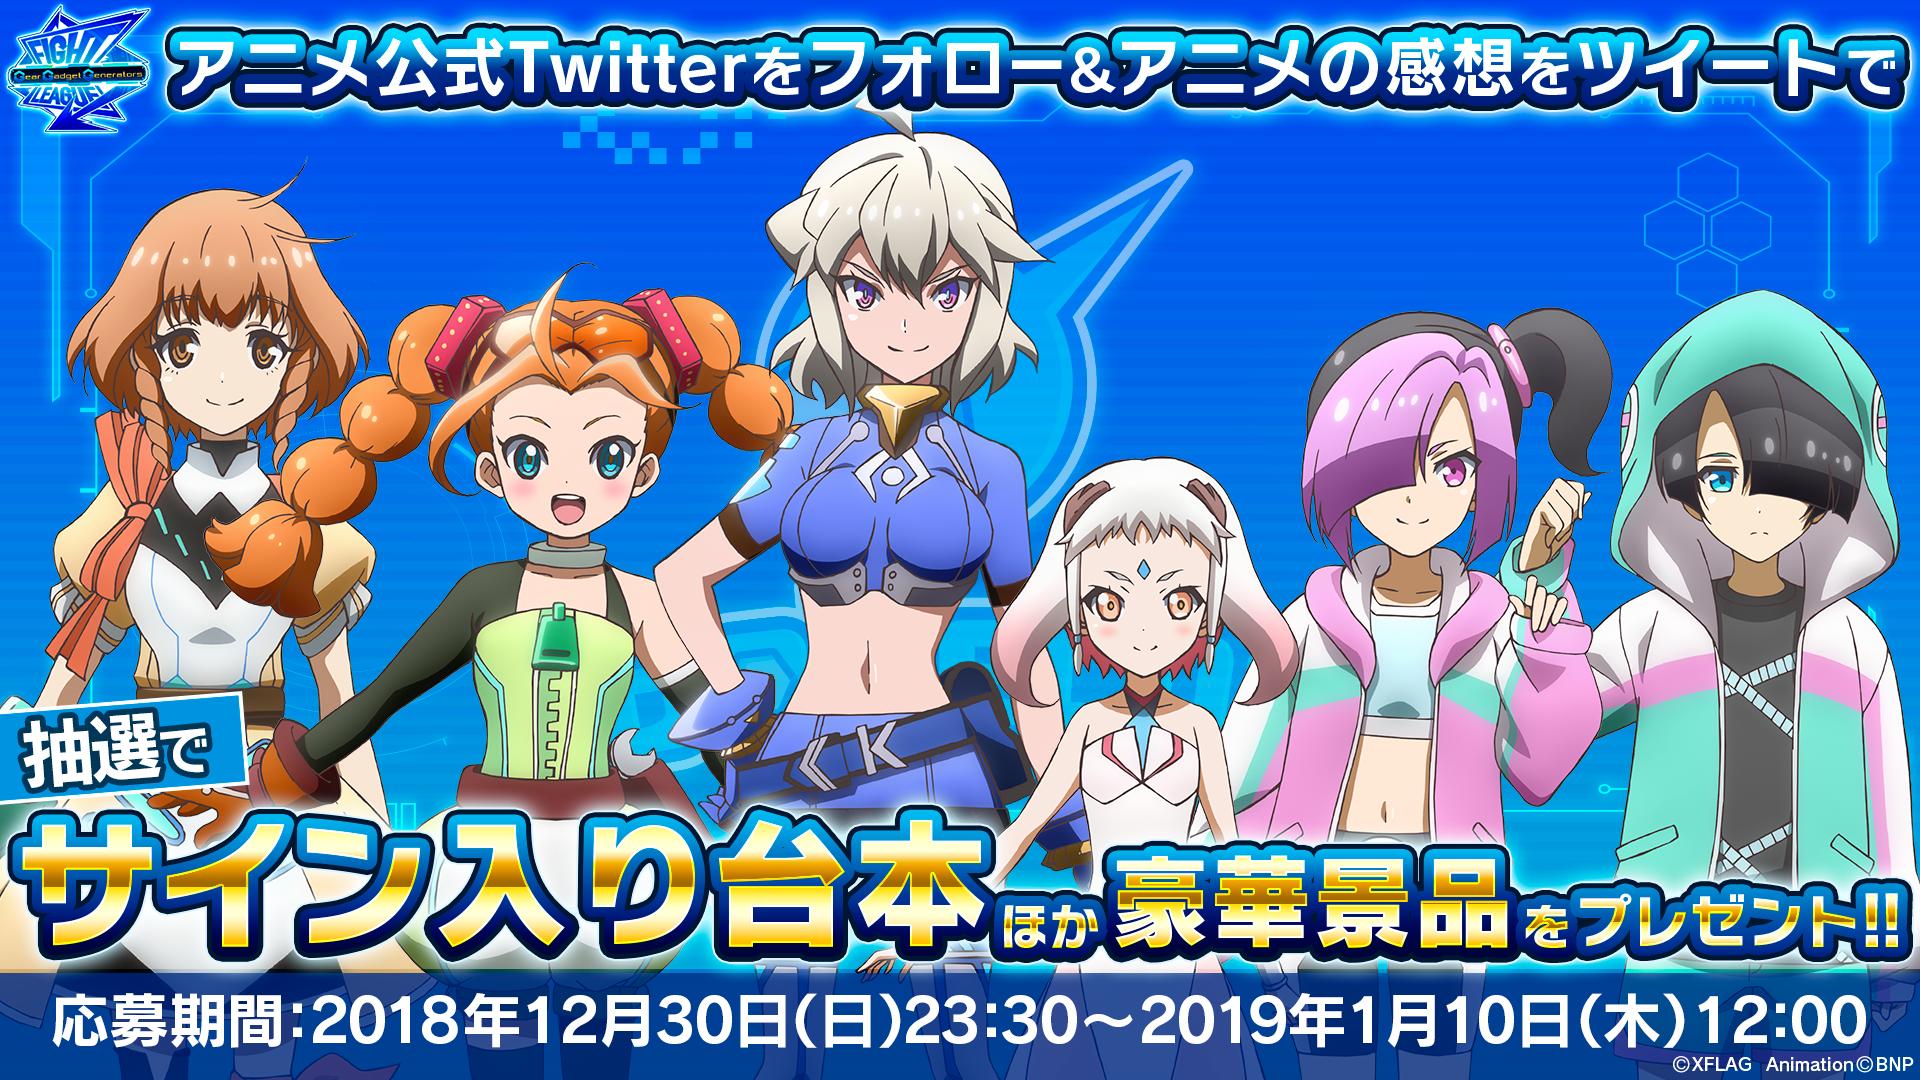 TwitterCP_番組感想キャンペーン_181221.png